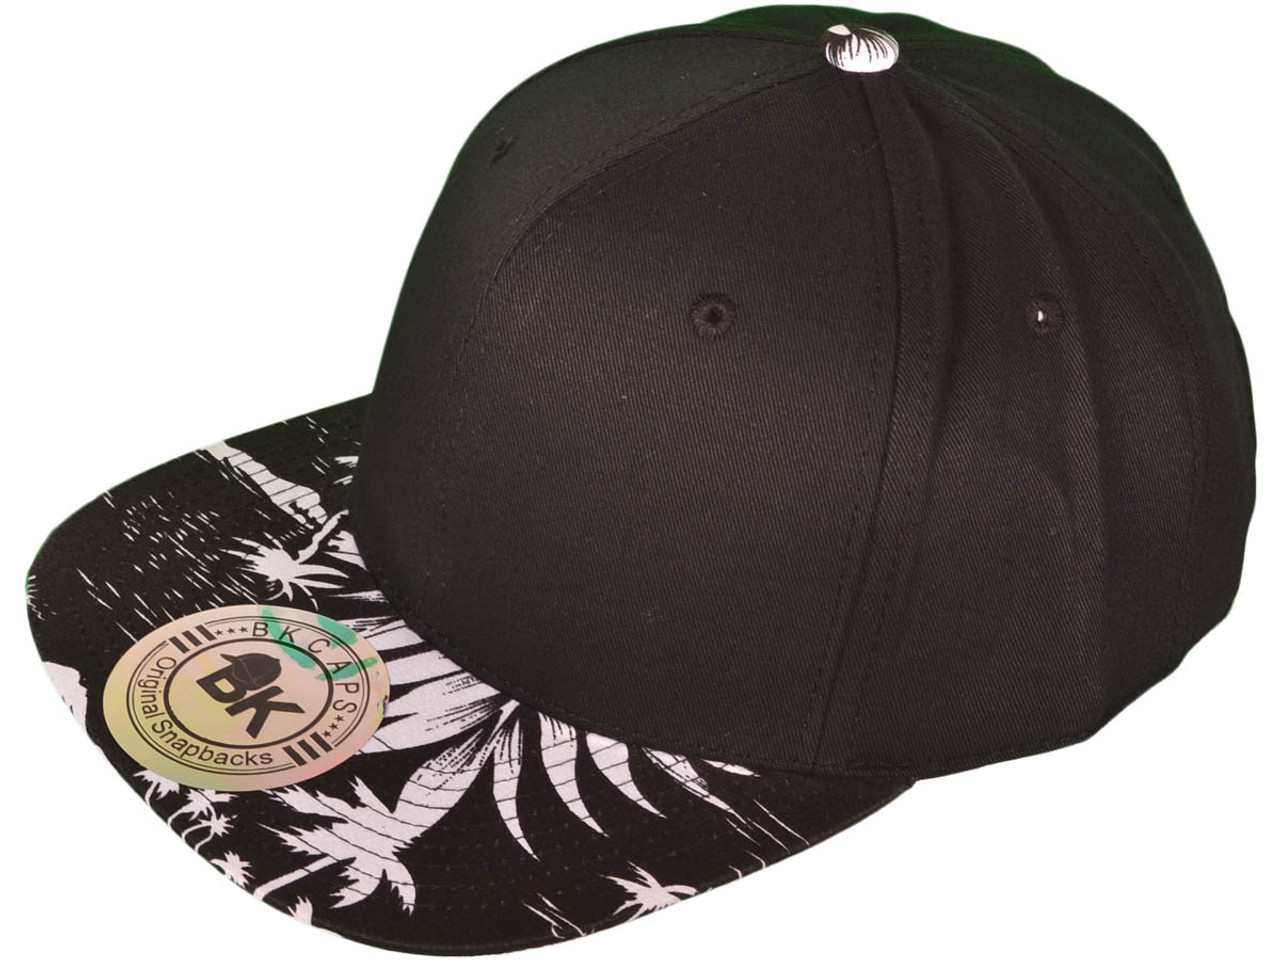 5778b0c0f5b bd-3.5-bd · bd-3.5-bd · Floral Cotton Snapback Hats - Flat Bill BK Caps ...